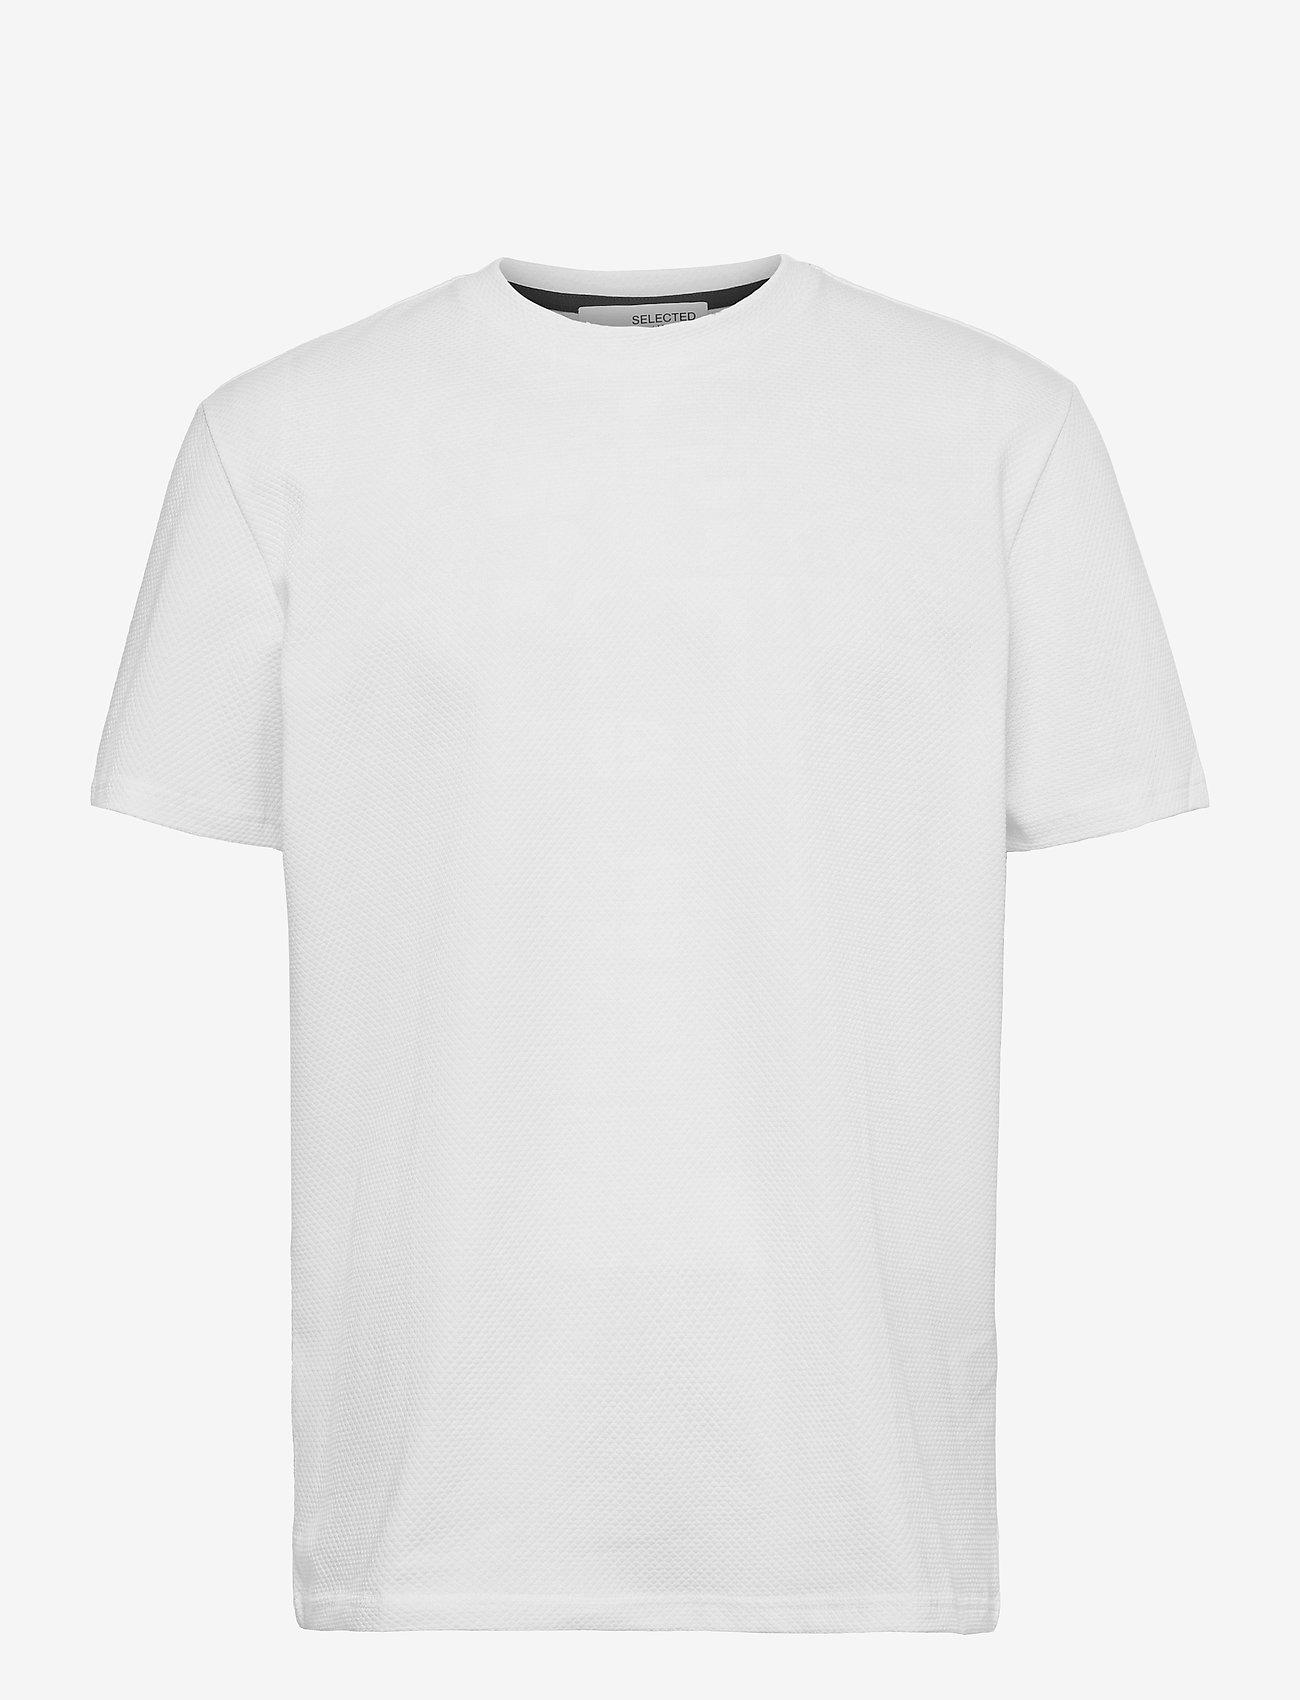 Selected Homme - SLHRELAXWAFFLE SS O-NECK TEE G - podstawowe koszulki - bright white - 0